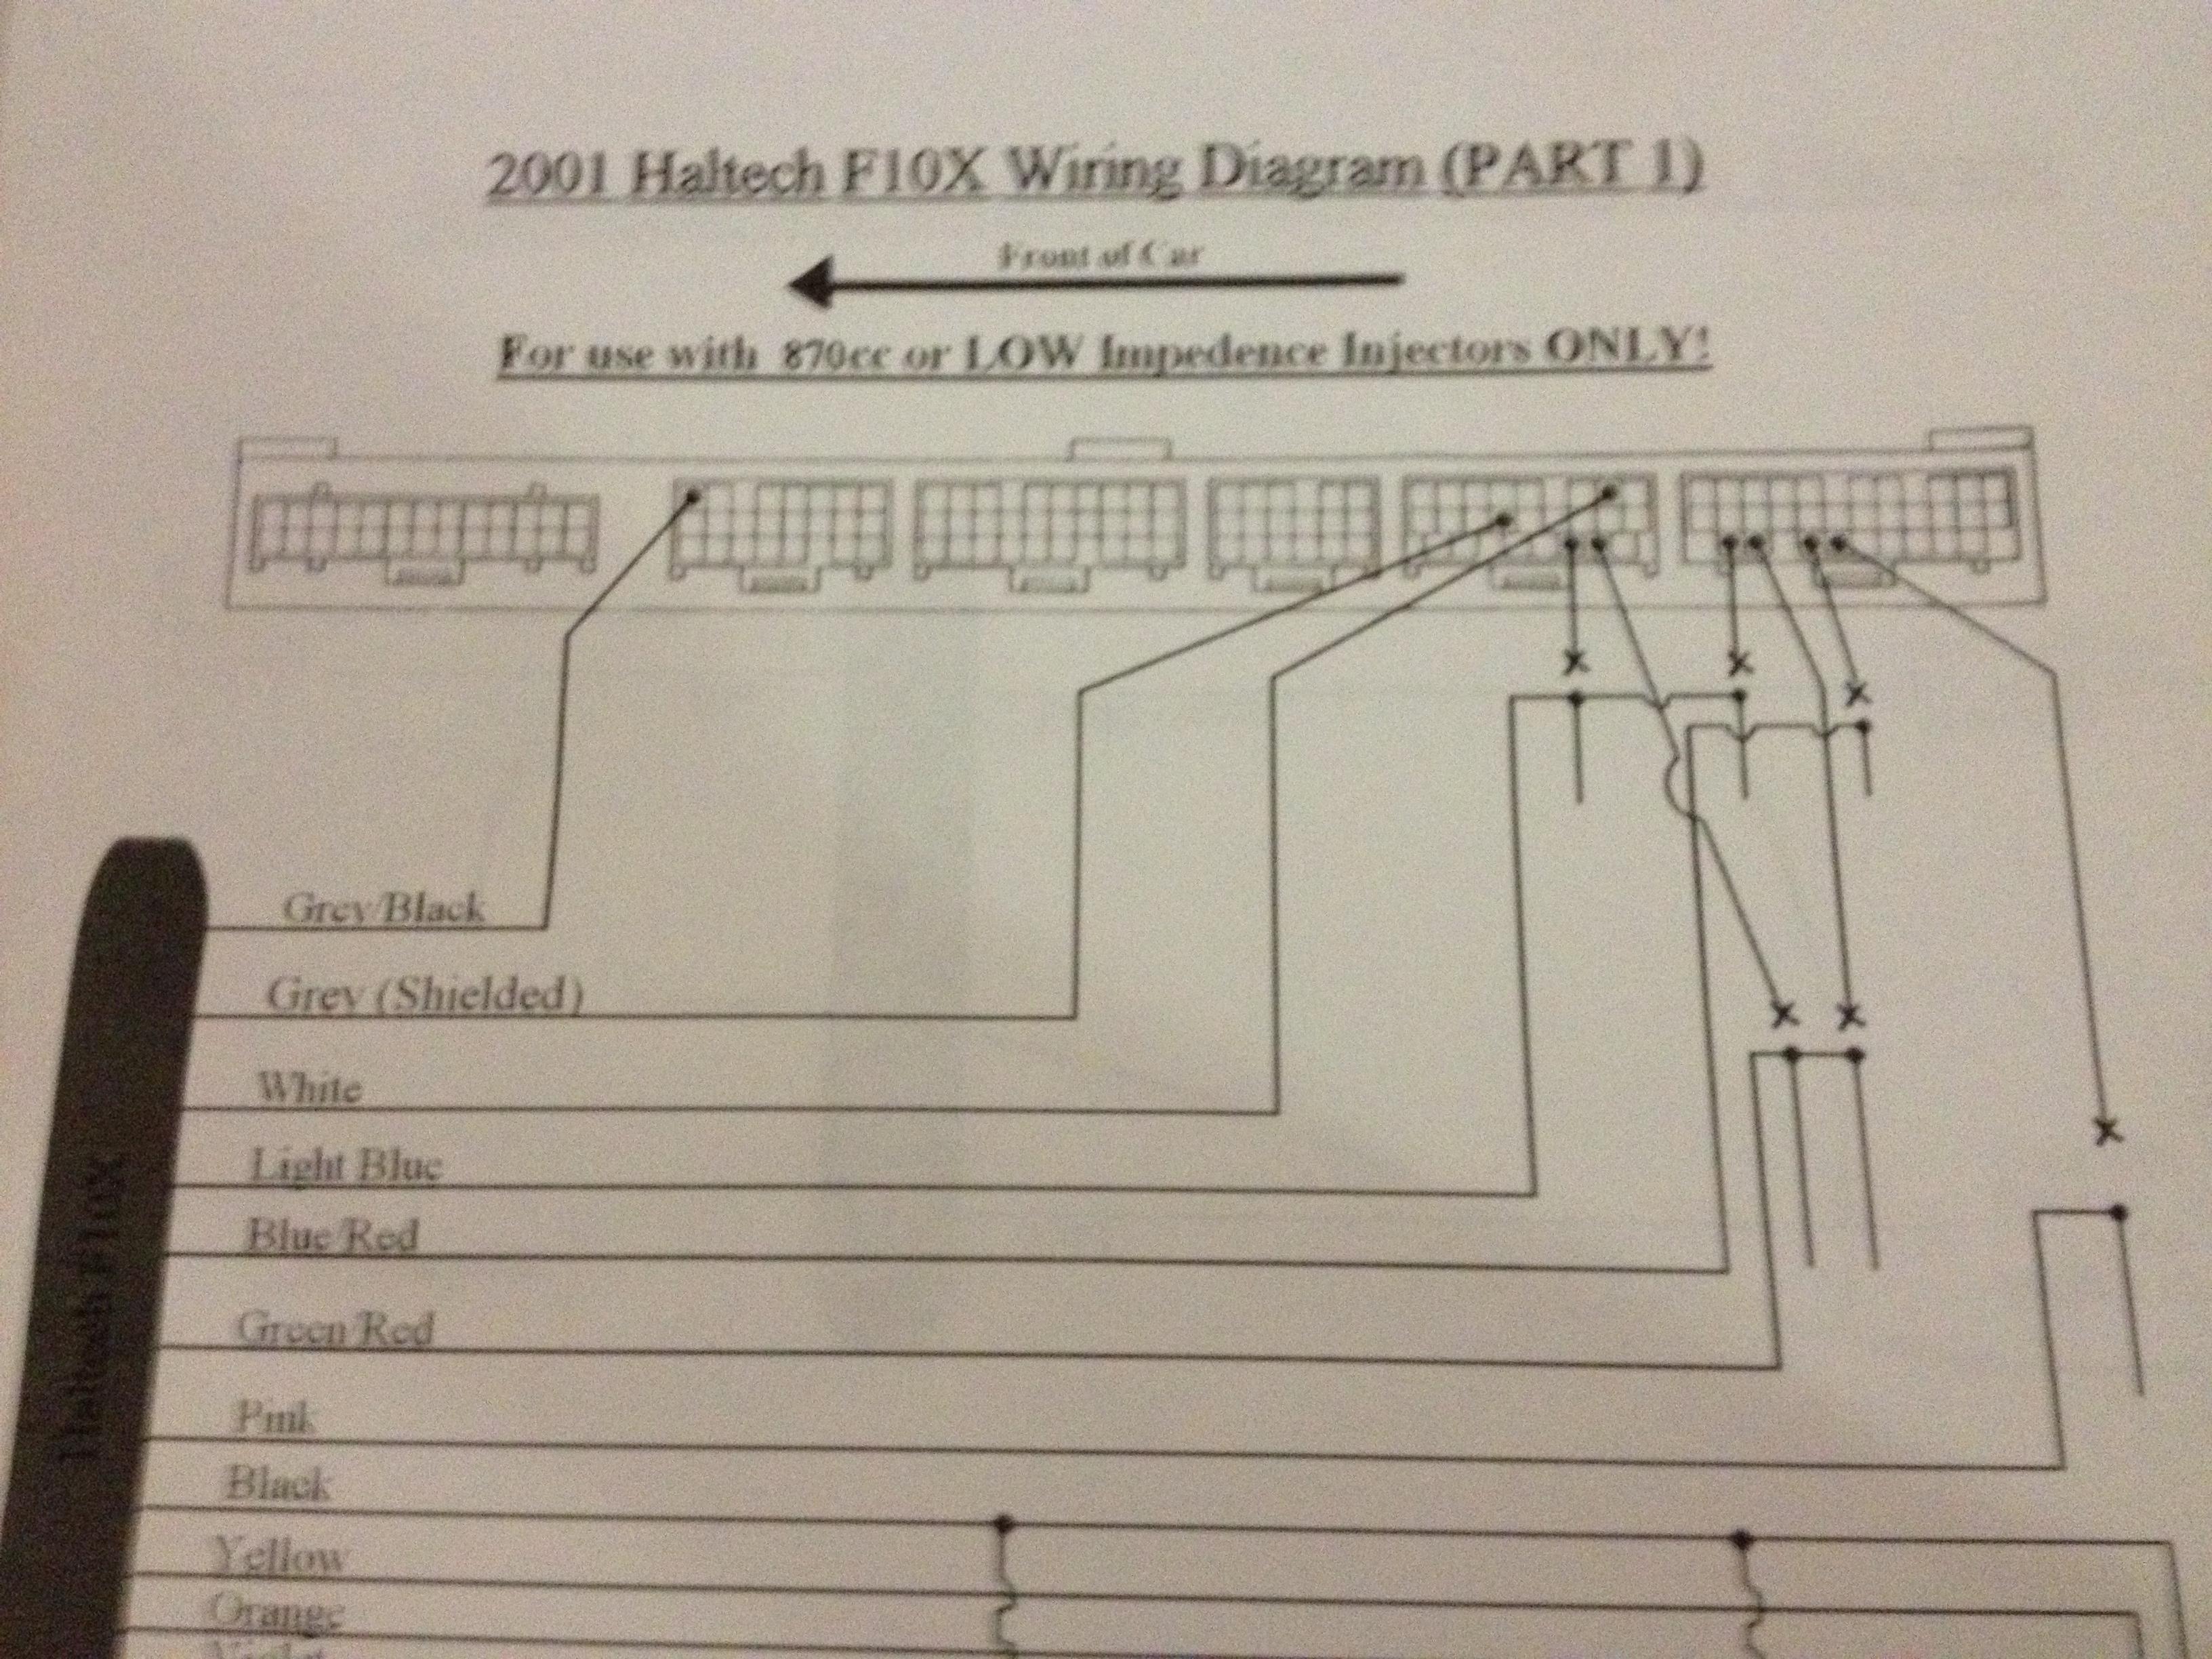 Help with F10X high Impedance injectors - Lexus IS Forum Haltech Sprint Re Wiring Diagram on flex-a-lite wiring diagram, ctek wiring diagram, dei wiring diagram, honda wiring diagram, denso wiring diagram, snow performance wiring diagram, msd wiring diagram, fuelab wiring diagram, gopro wiring diagram, auto meter wiring diagram, microtech wiring diagram,